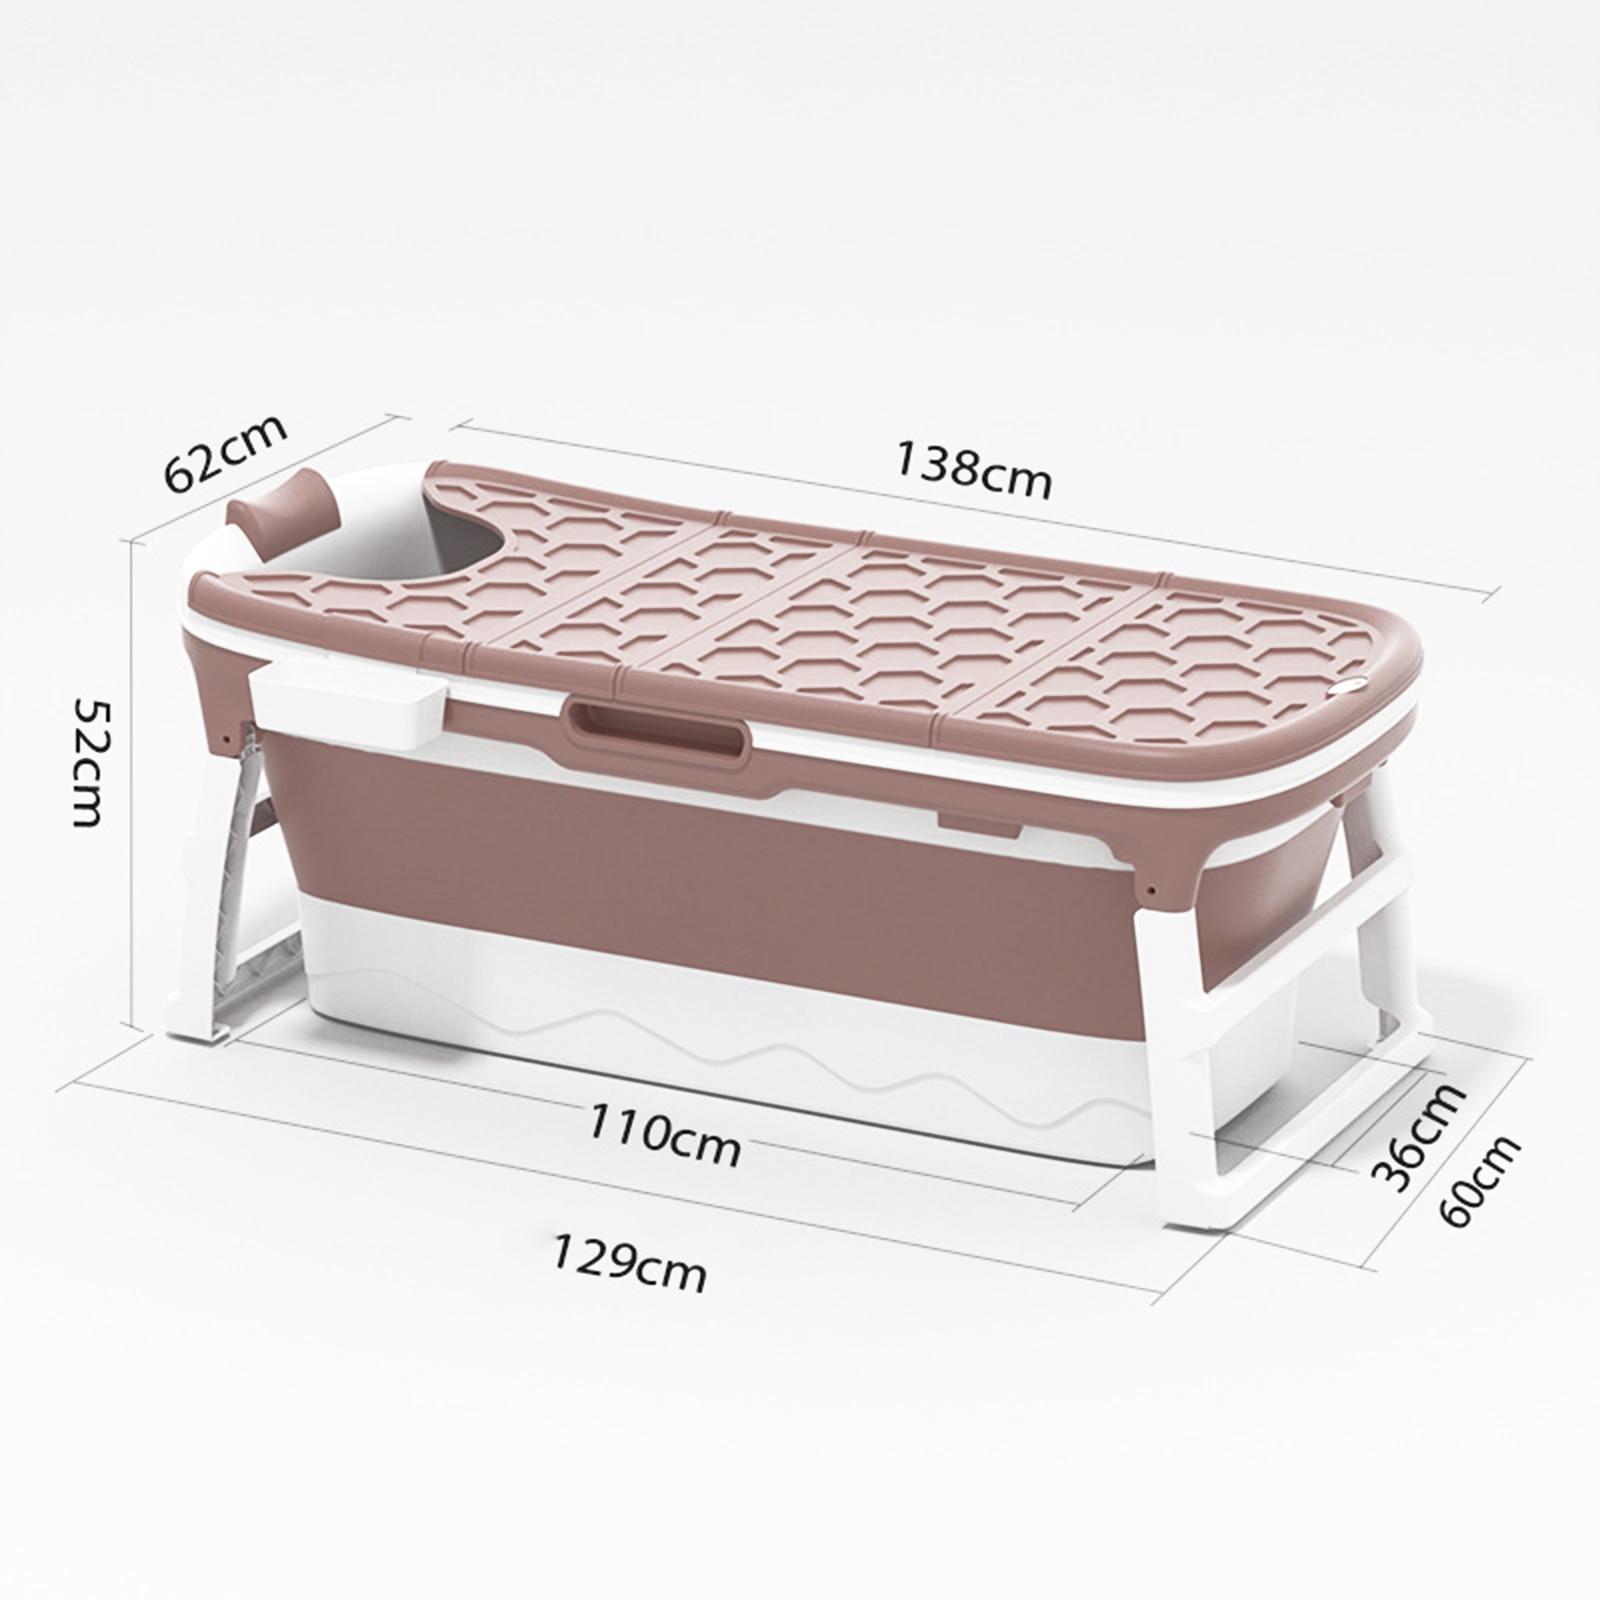 1.4m Adult Folding Bathtub Thickening Folding Bathtub Portable Large Household Bathtub Bucket Whole Body Child Sauna enlarge